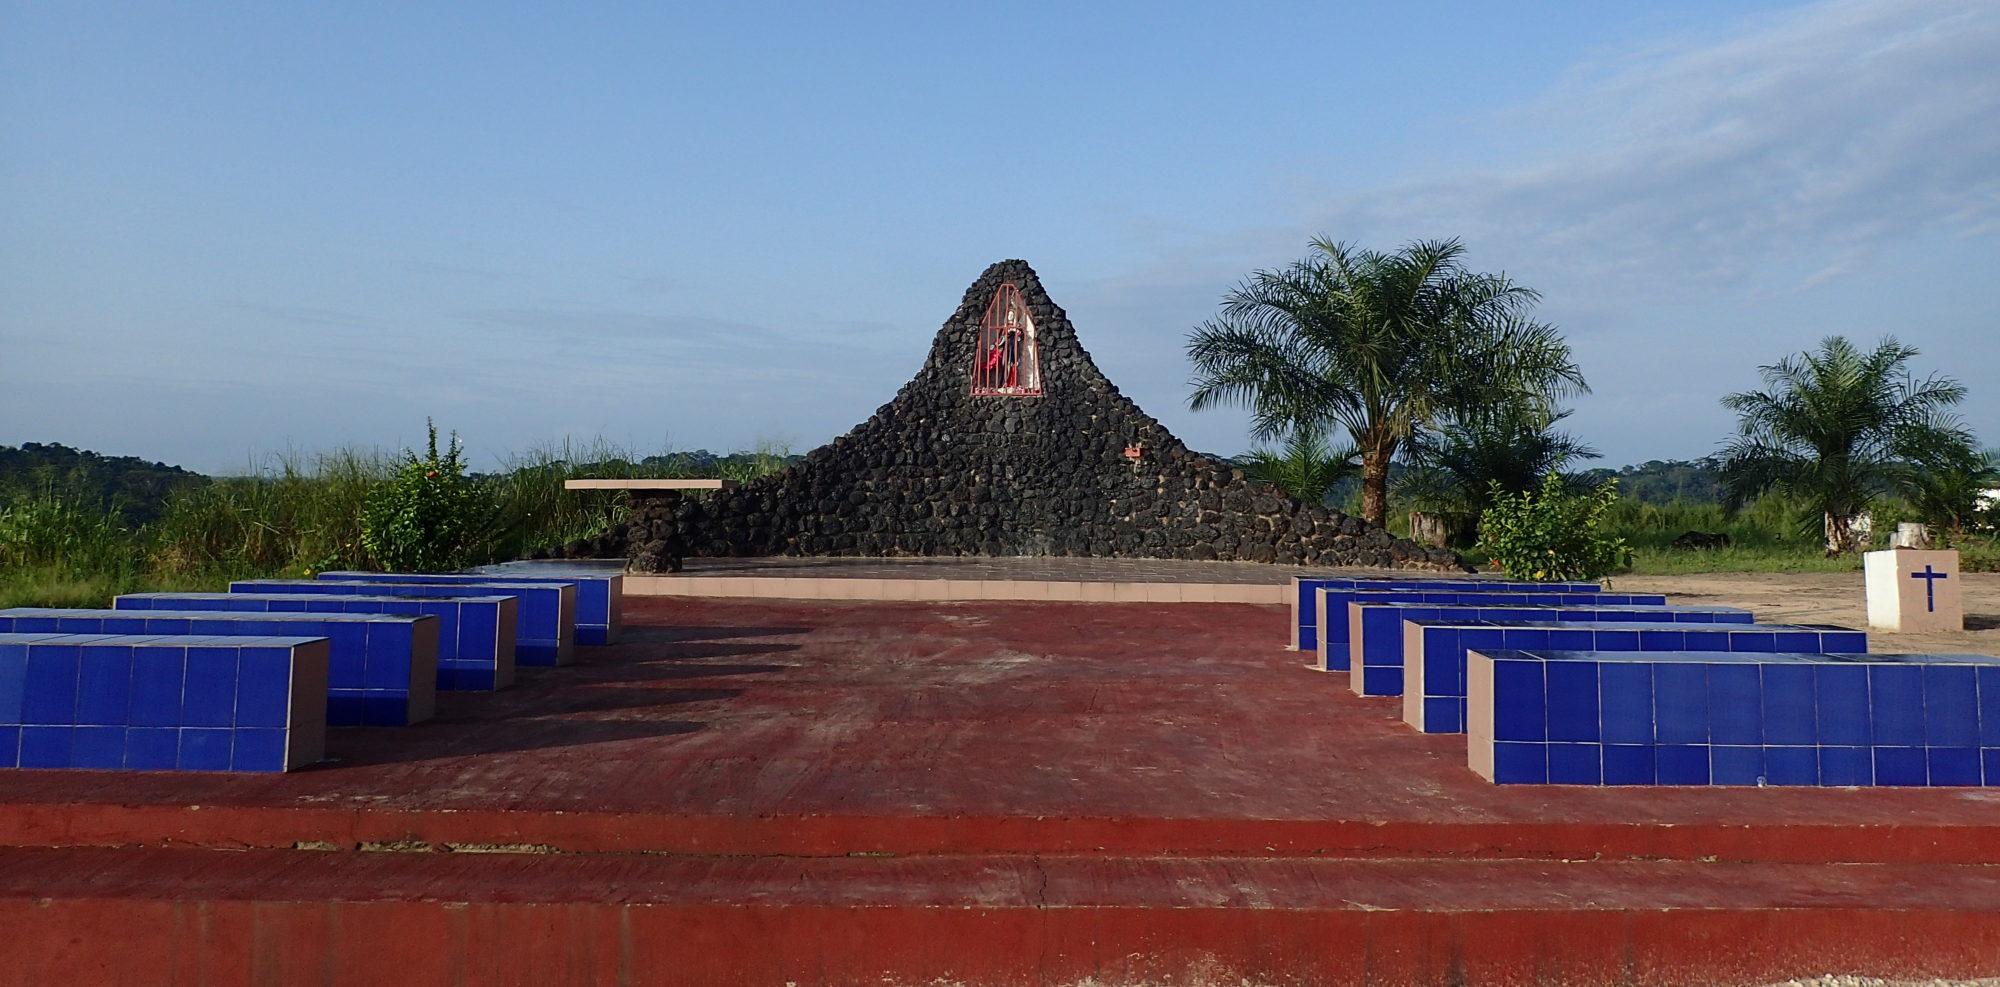 Inzo Ya Bana - La Maison des Enfants